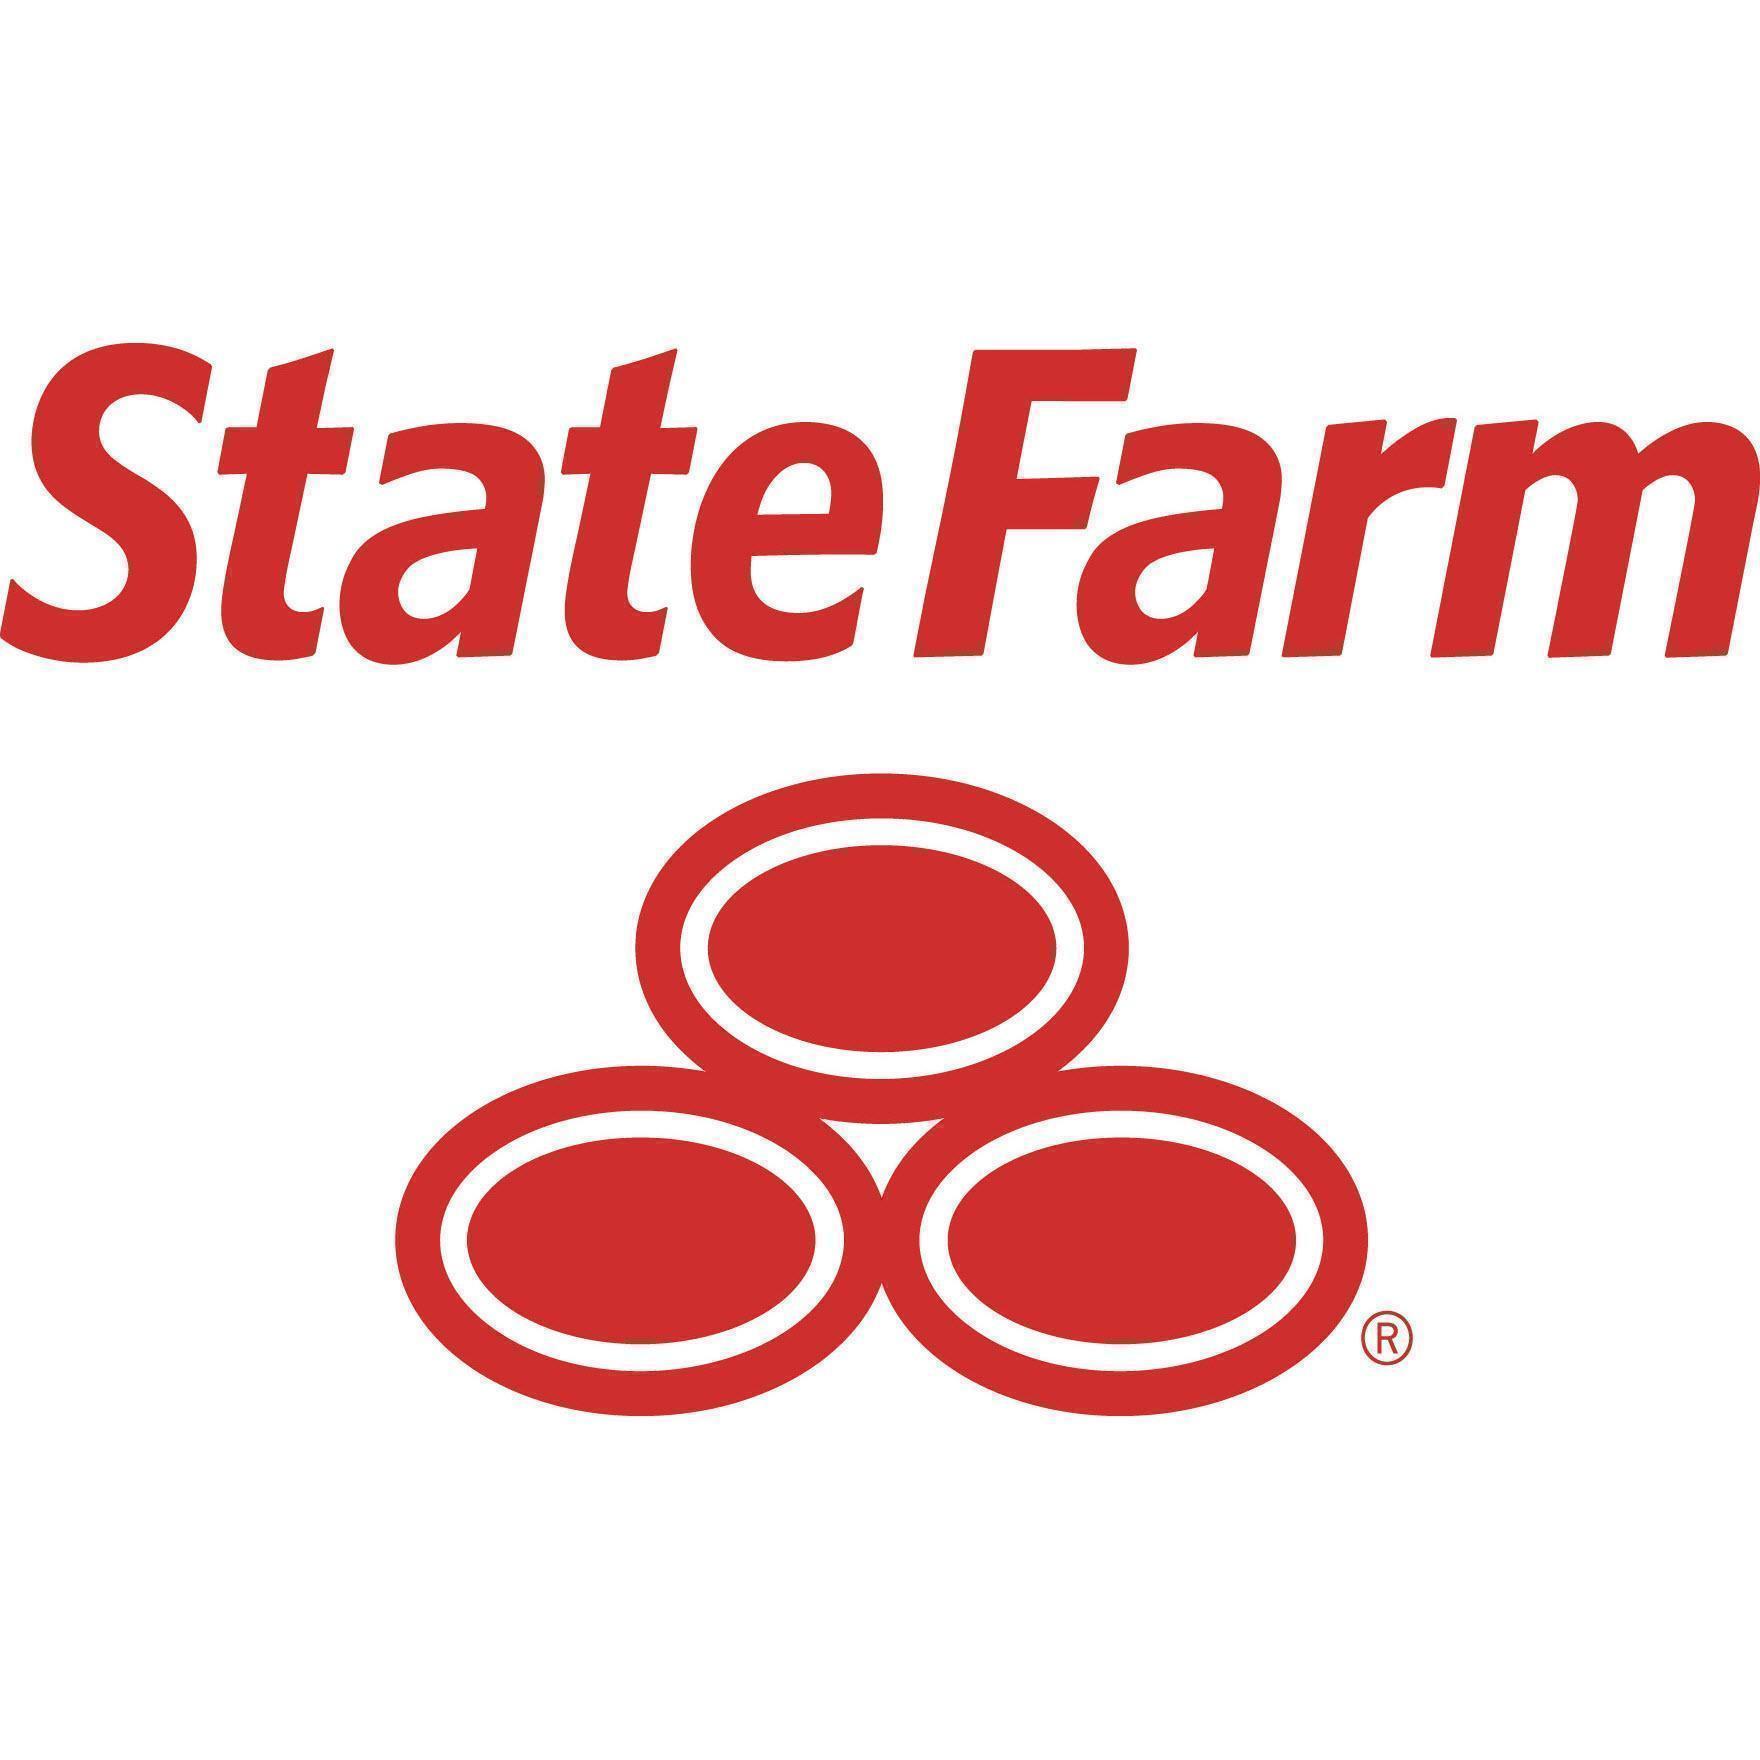 Jeremy Savageau - State Farm Insurance Agent